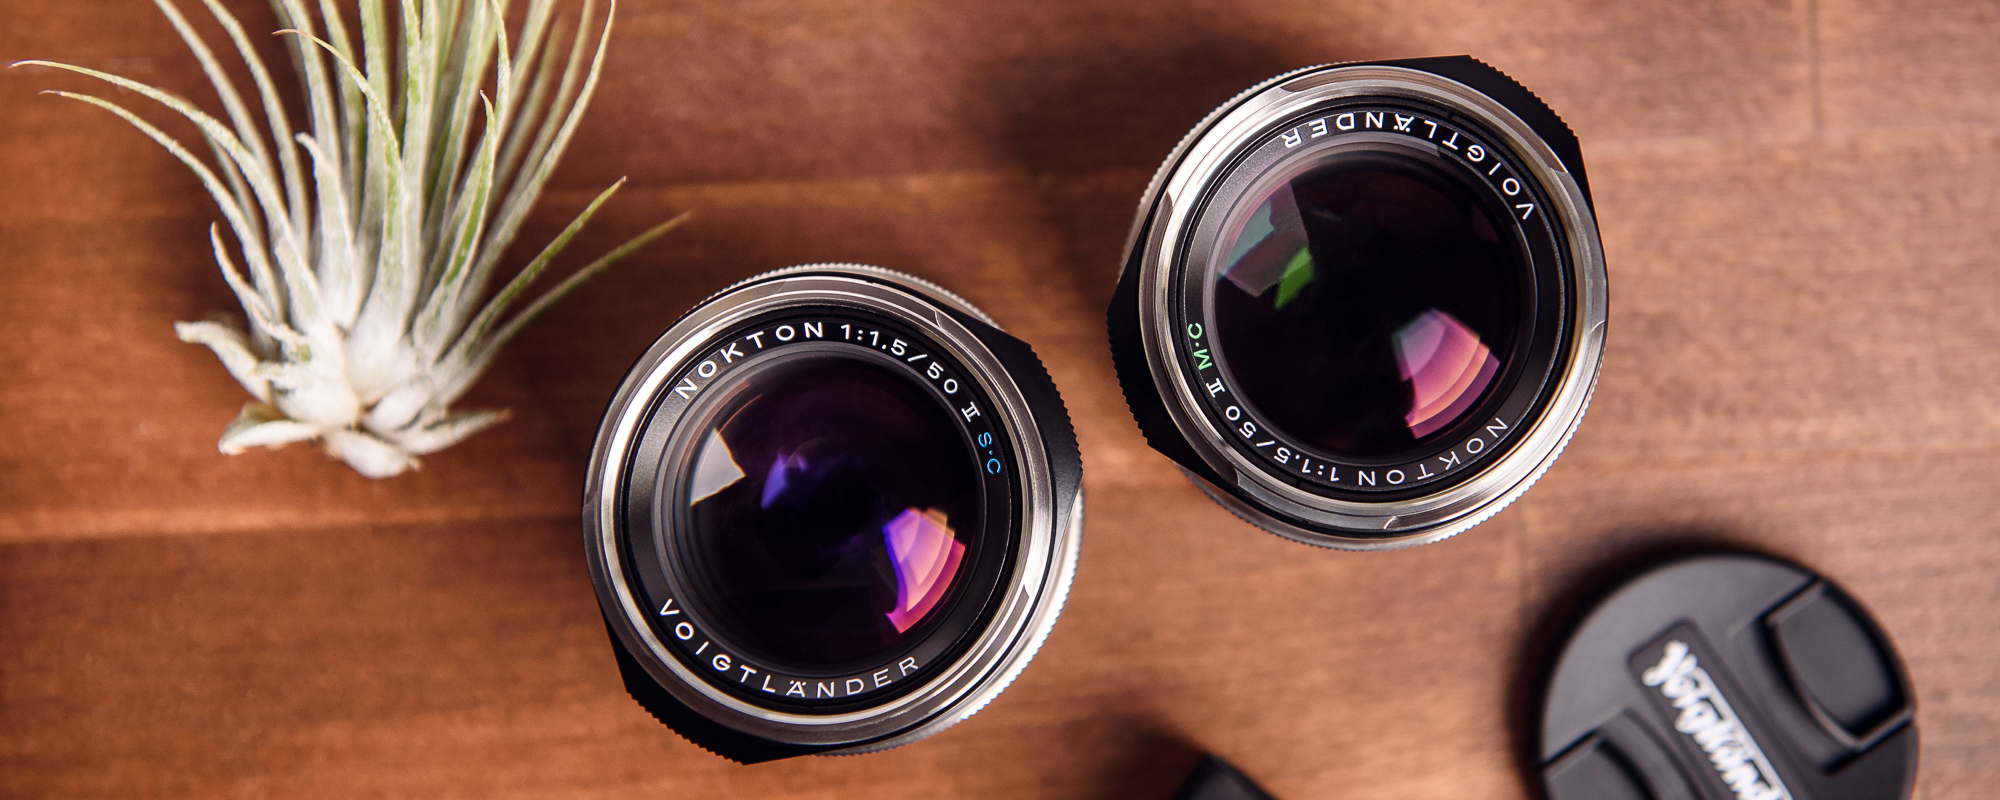 Obiektyw Voigtlander Nokton II 50 mm f/1,5 do Leica M - powłoki SC i MC